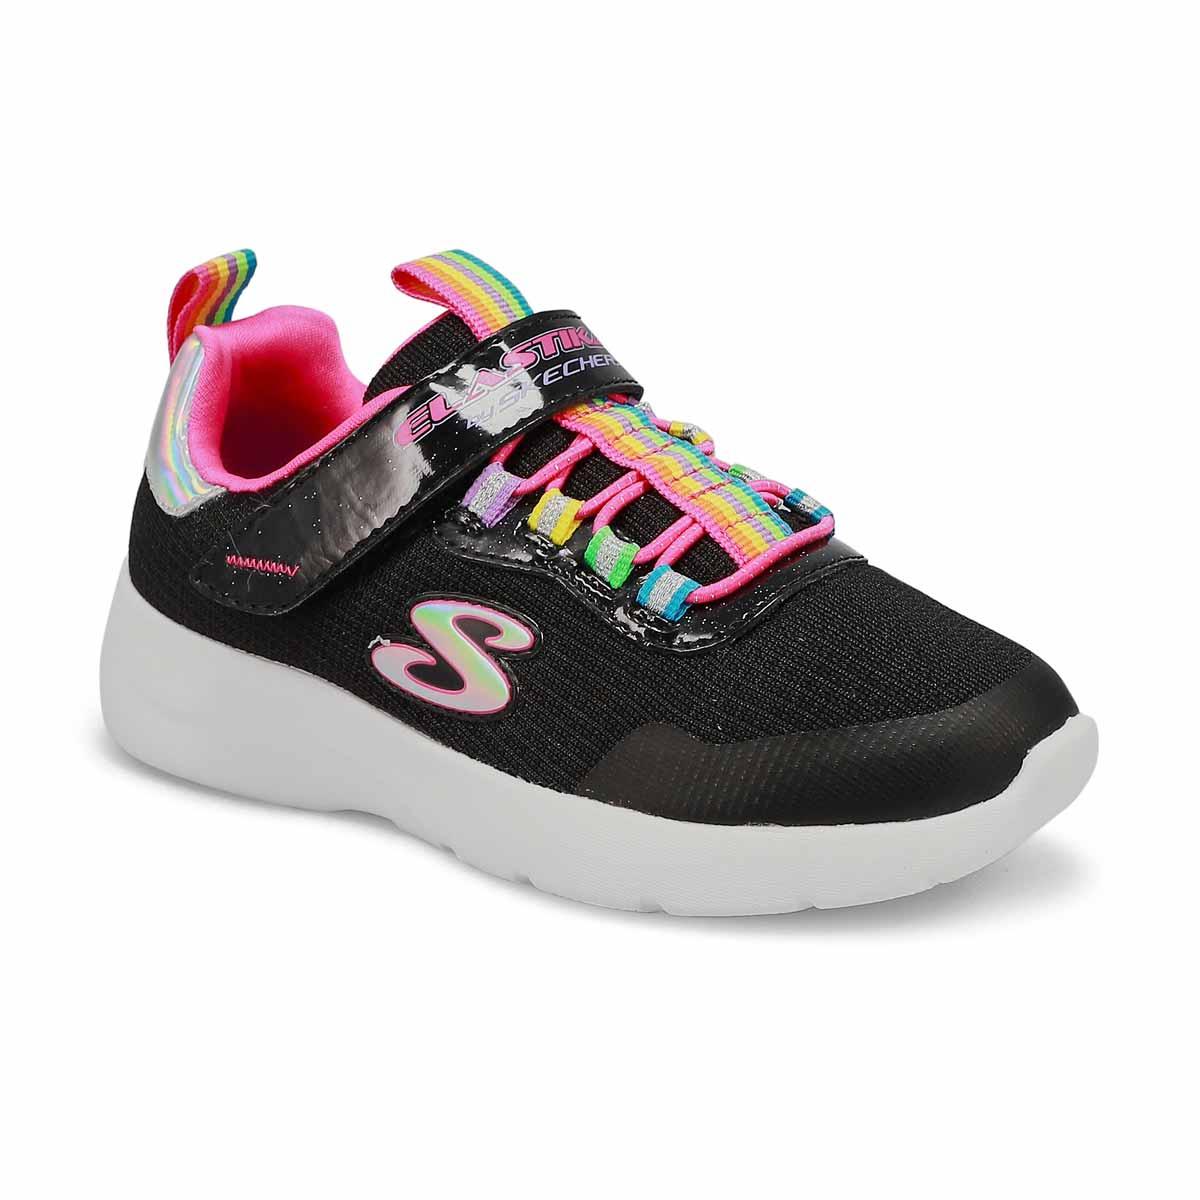 Girls' Dynamight 2.0 Sneakers - Black/Multi